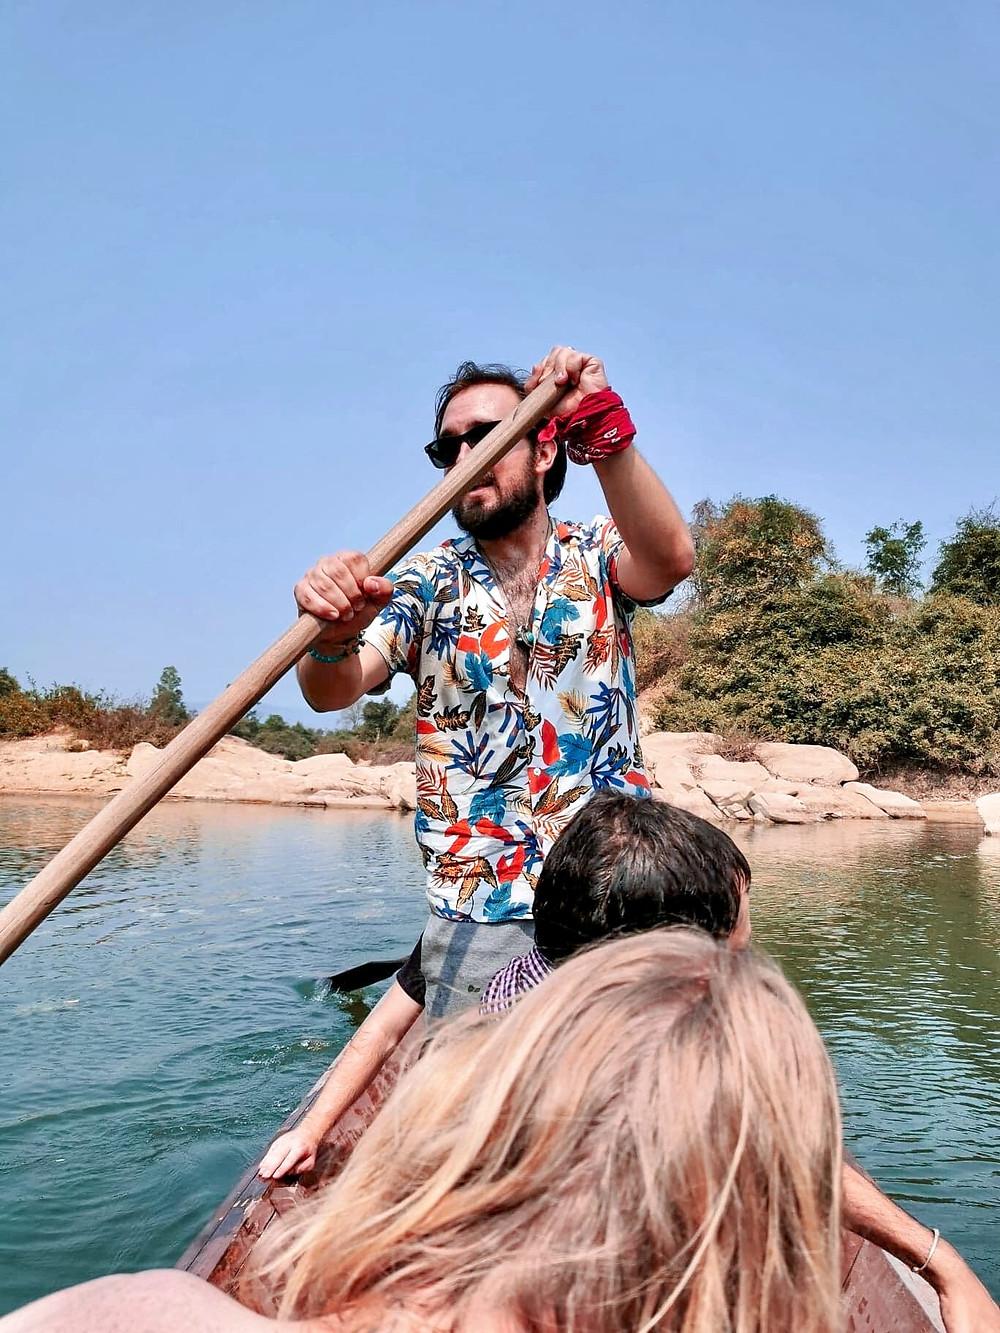 Peeplo talks -a day on the Mekong in Laos - Bawra Musafir